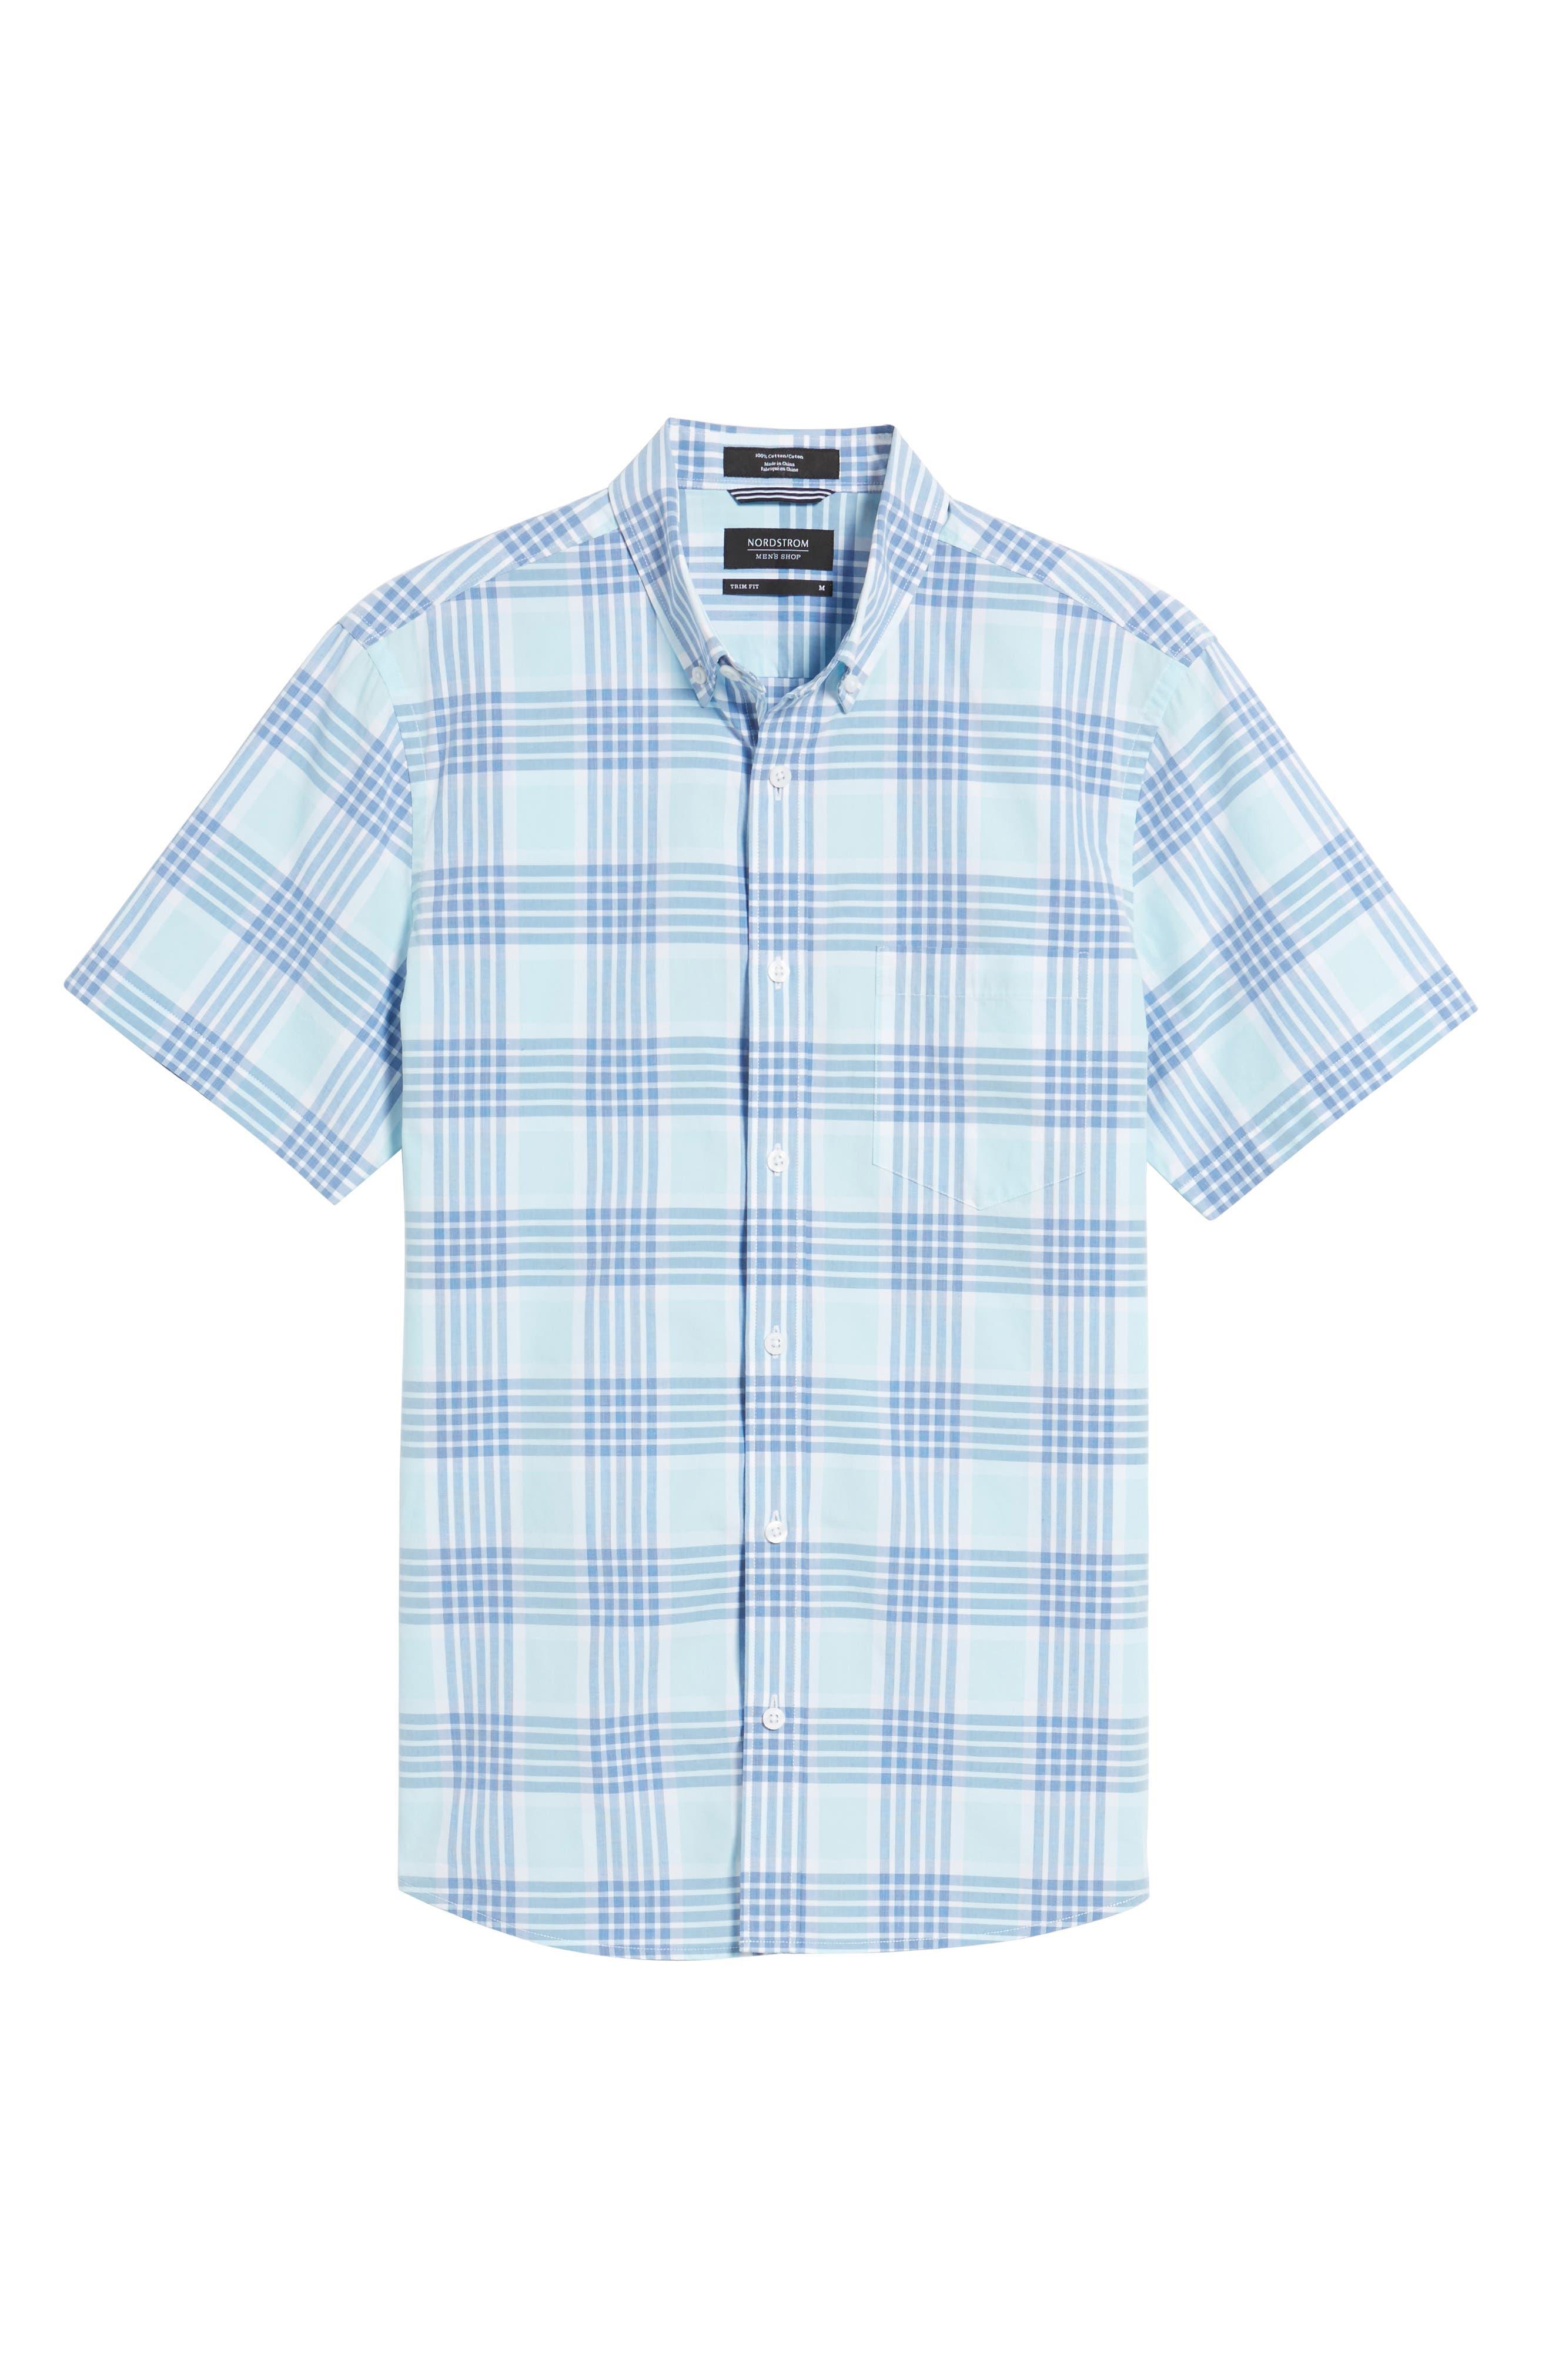 Trim Fit Washed Plaid Sport Shirt,                             Alternate thumbnail 6, color,                             Blue Aquatic Plaid